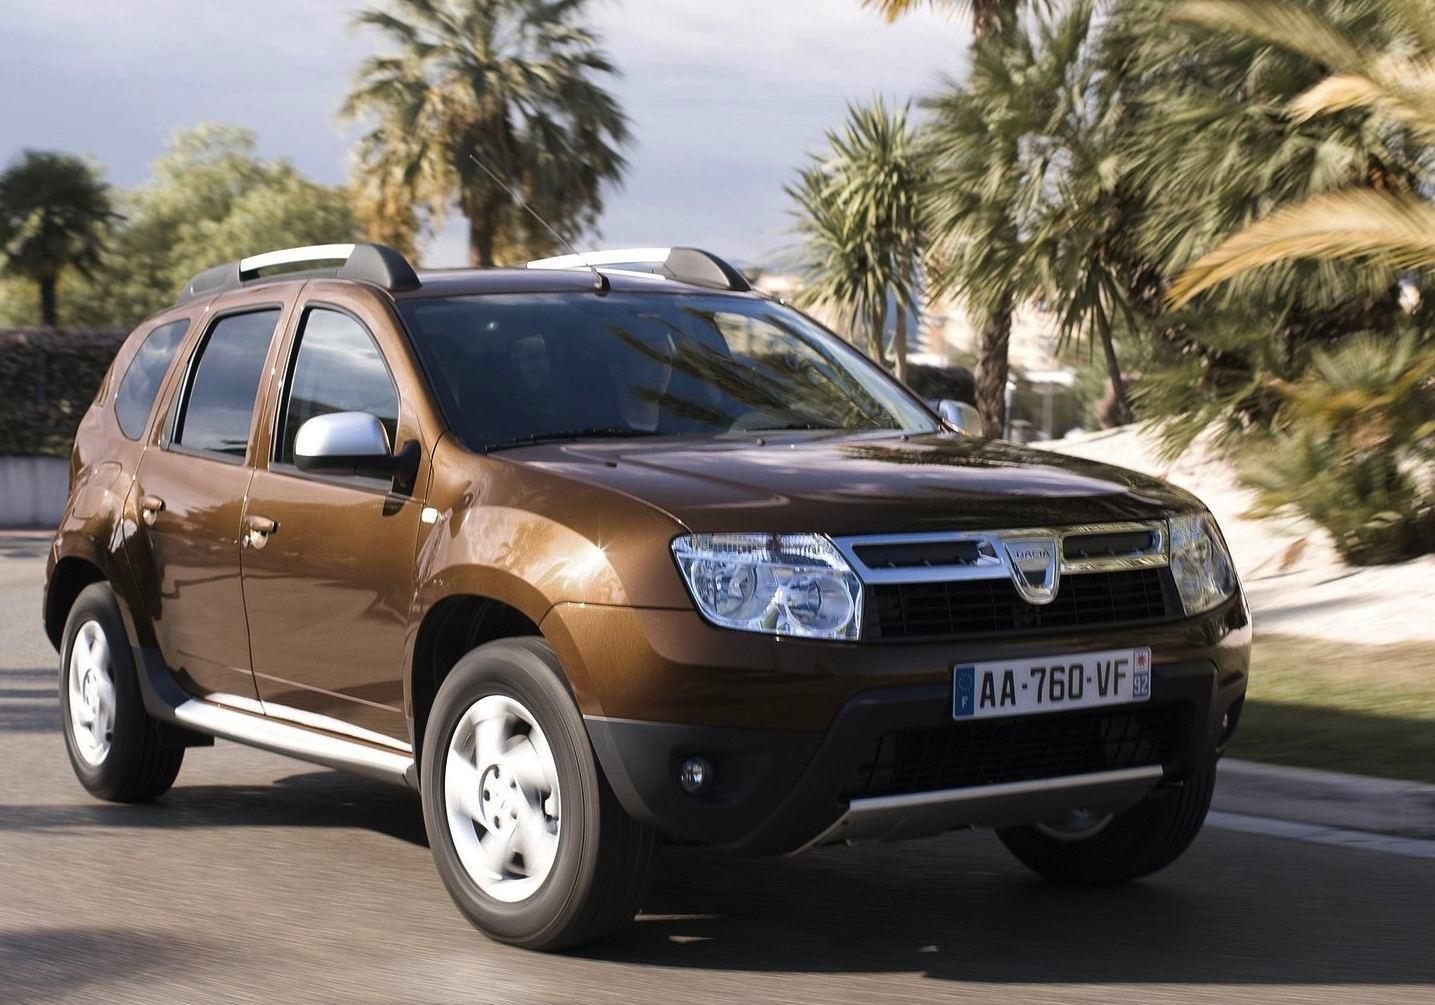 algeria february 2011 symbol 1 duster in top 10 best selling cars blog. Black Bedroom Furniture Sets. Home Design Ideas